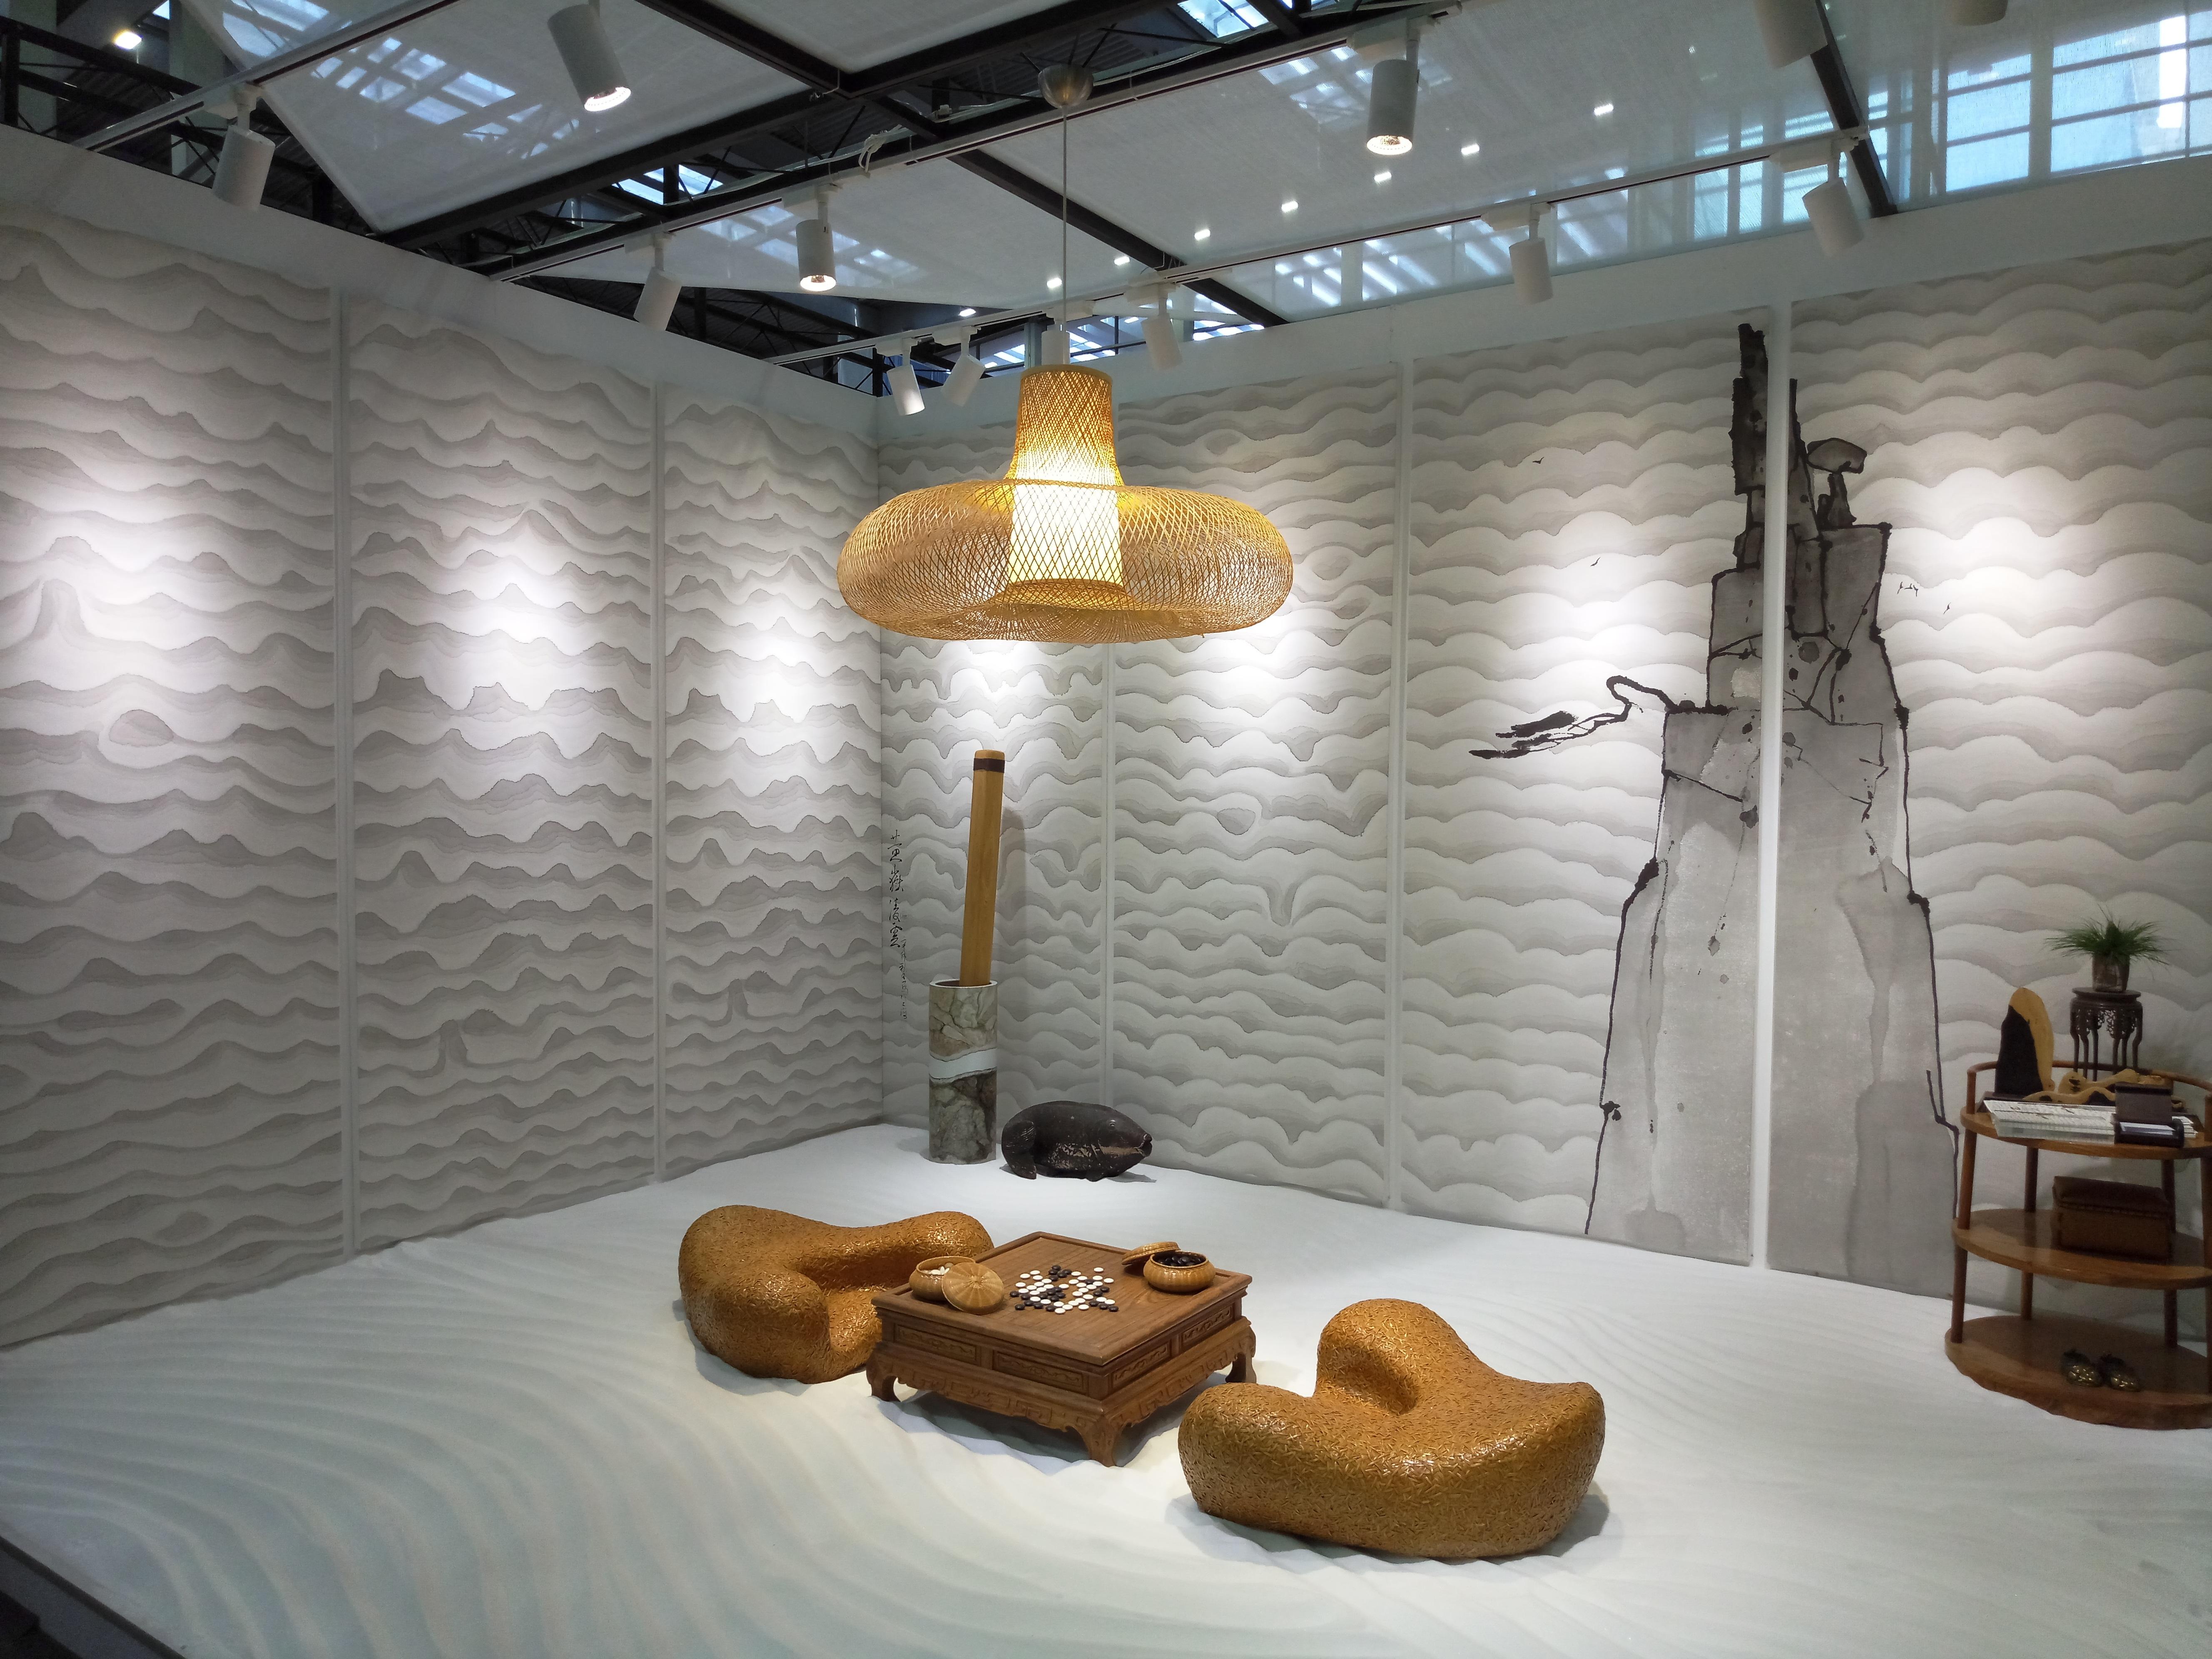 Free Images : floor, room, interior design, home improvement ...